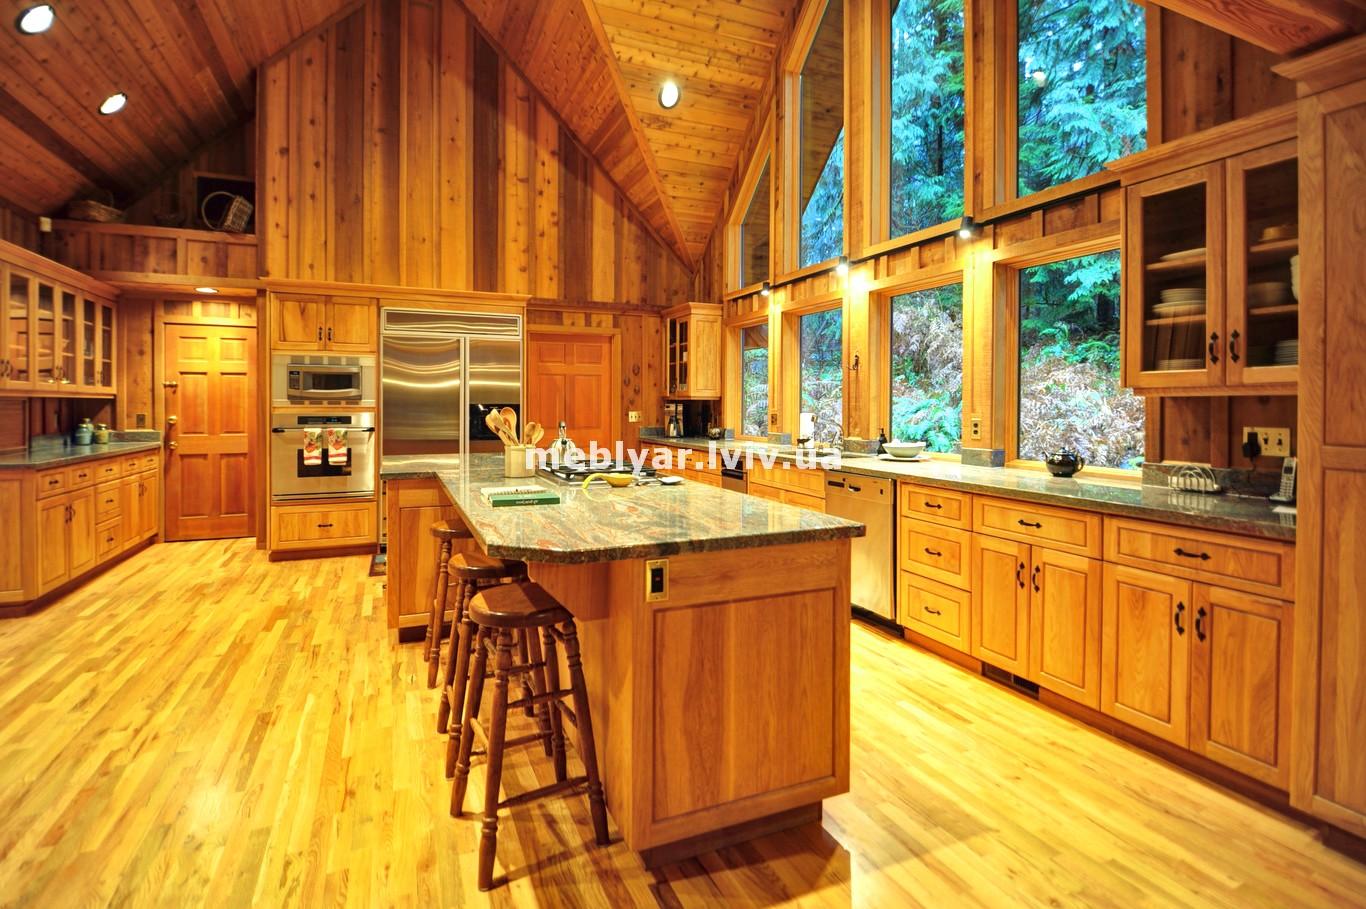 догляд за кухнею з масиву дерева